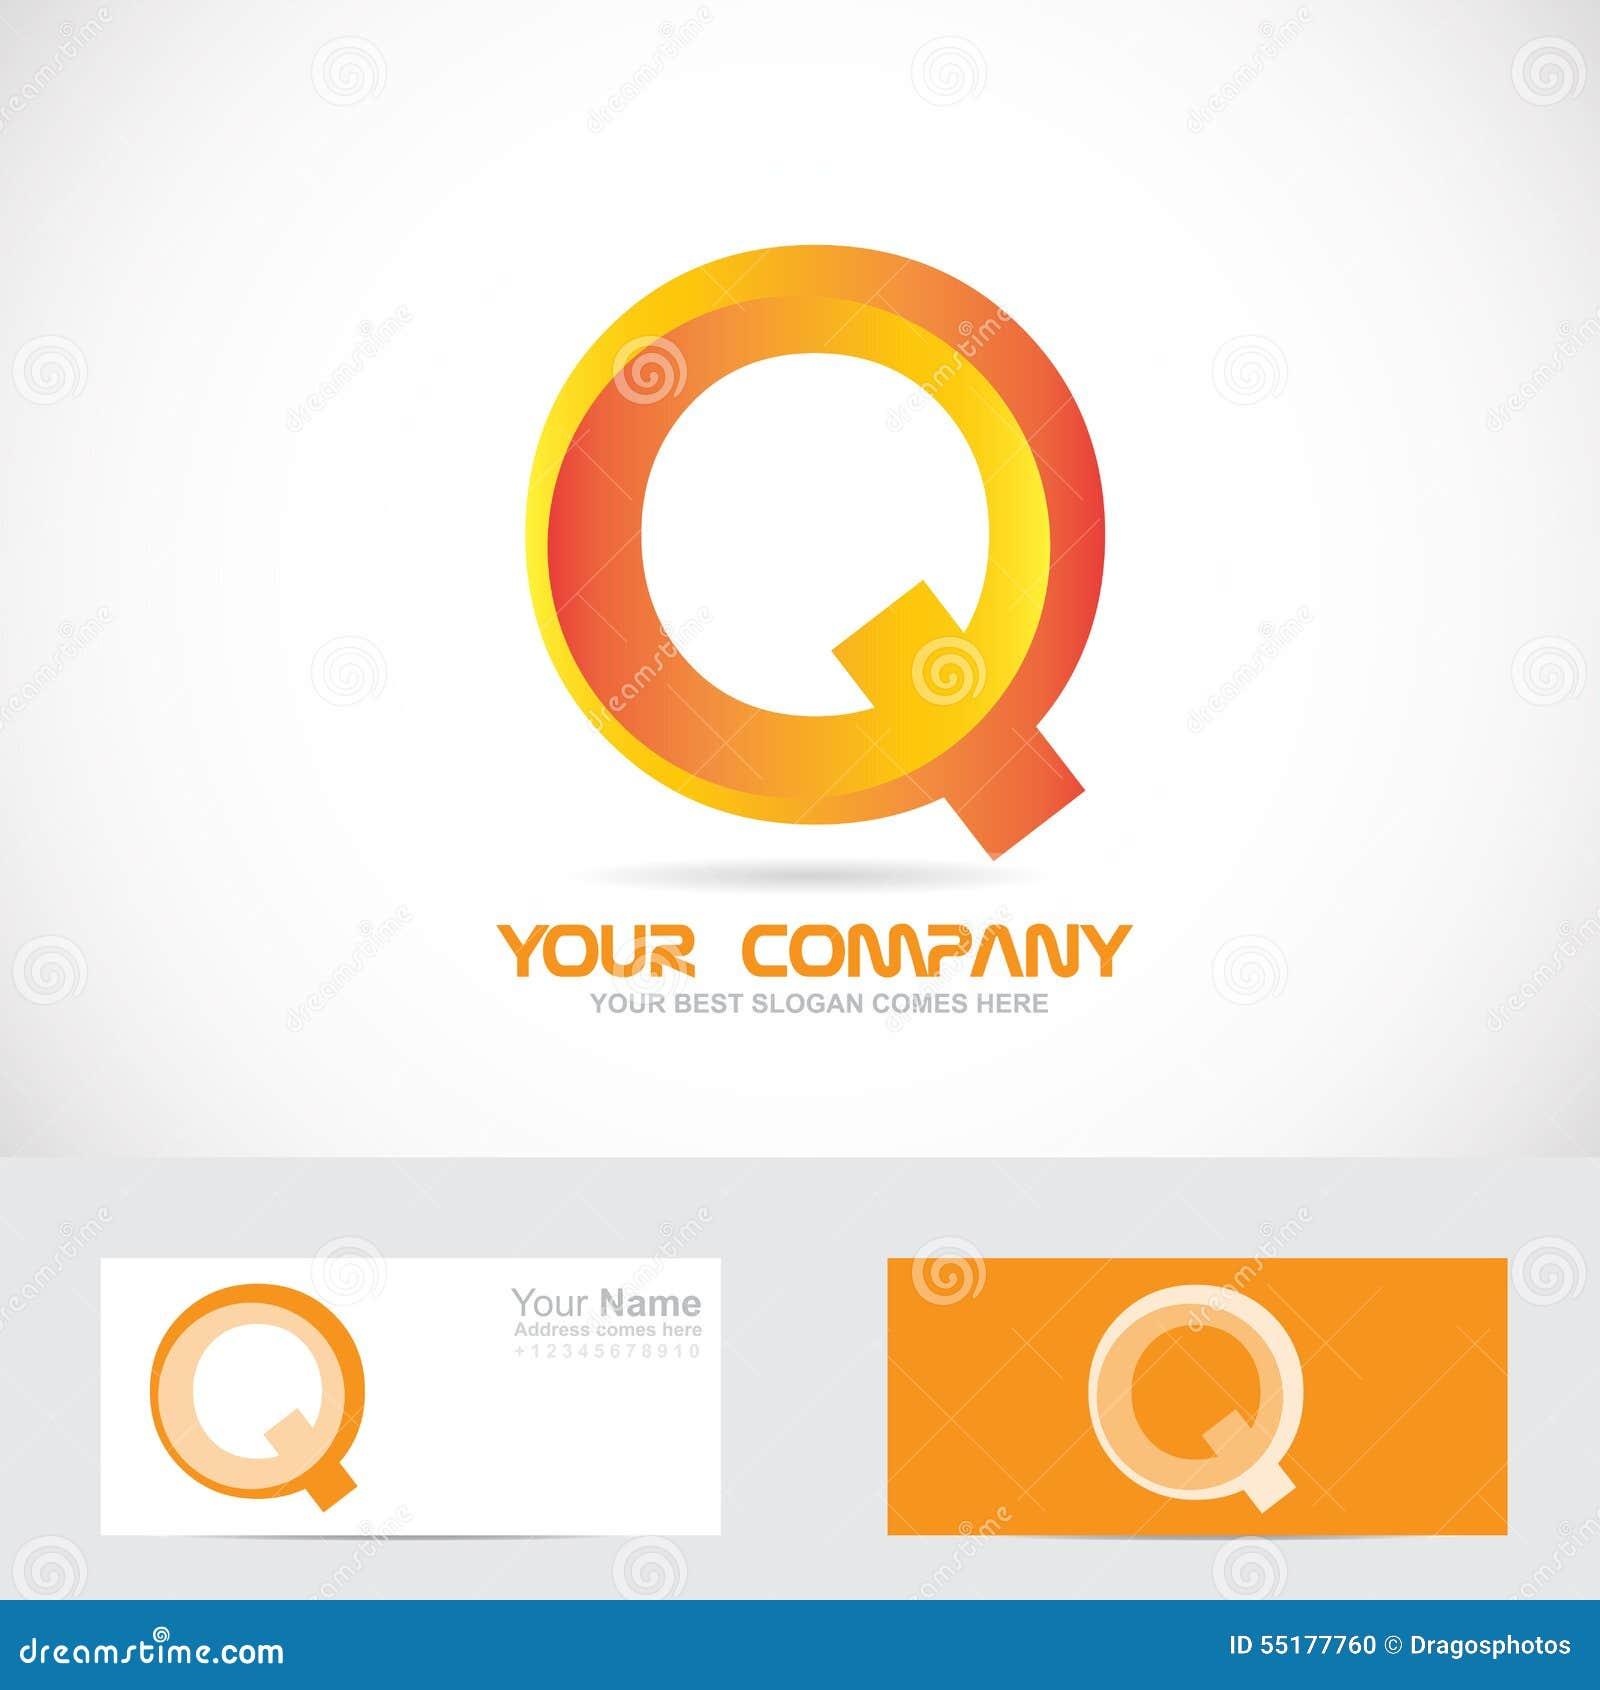 Letter q orange 3d logo icon